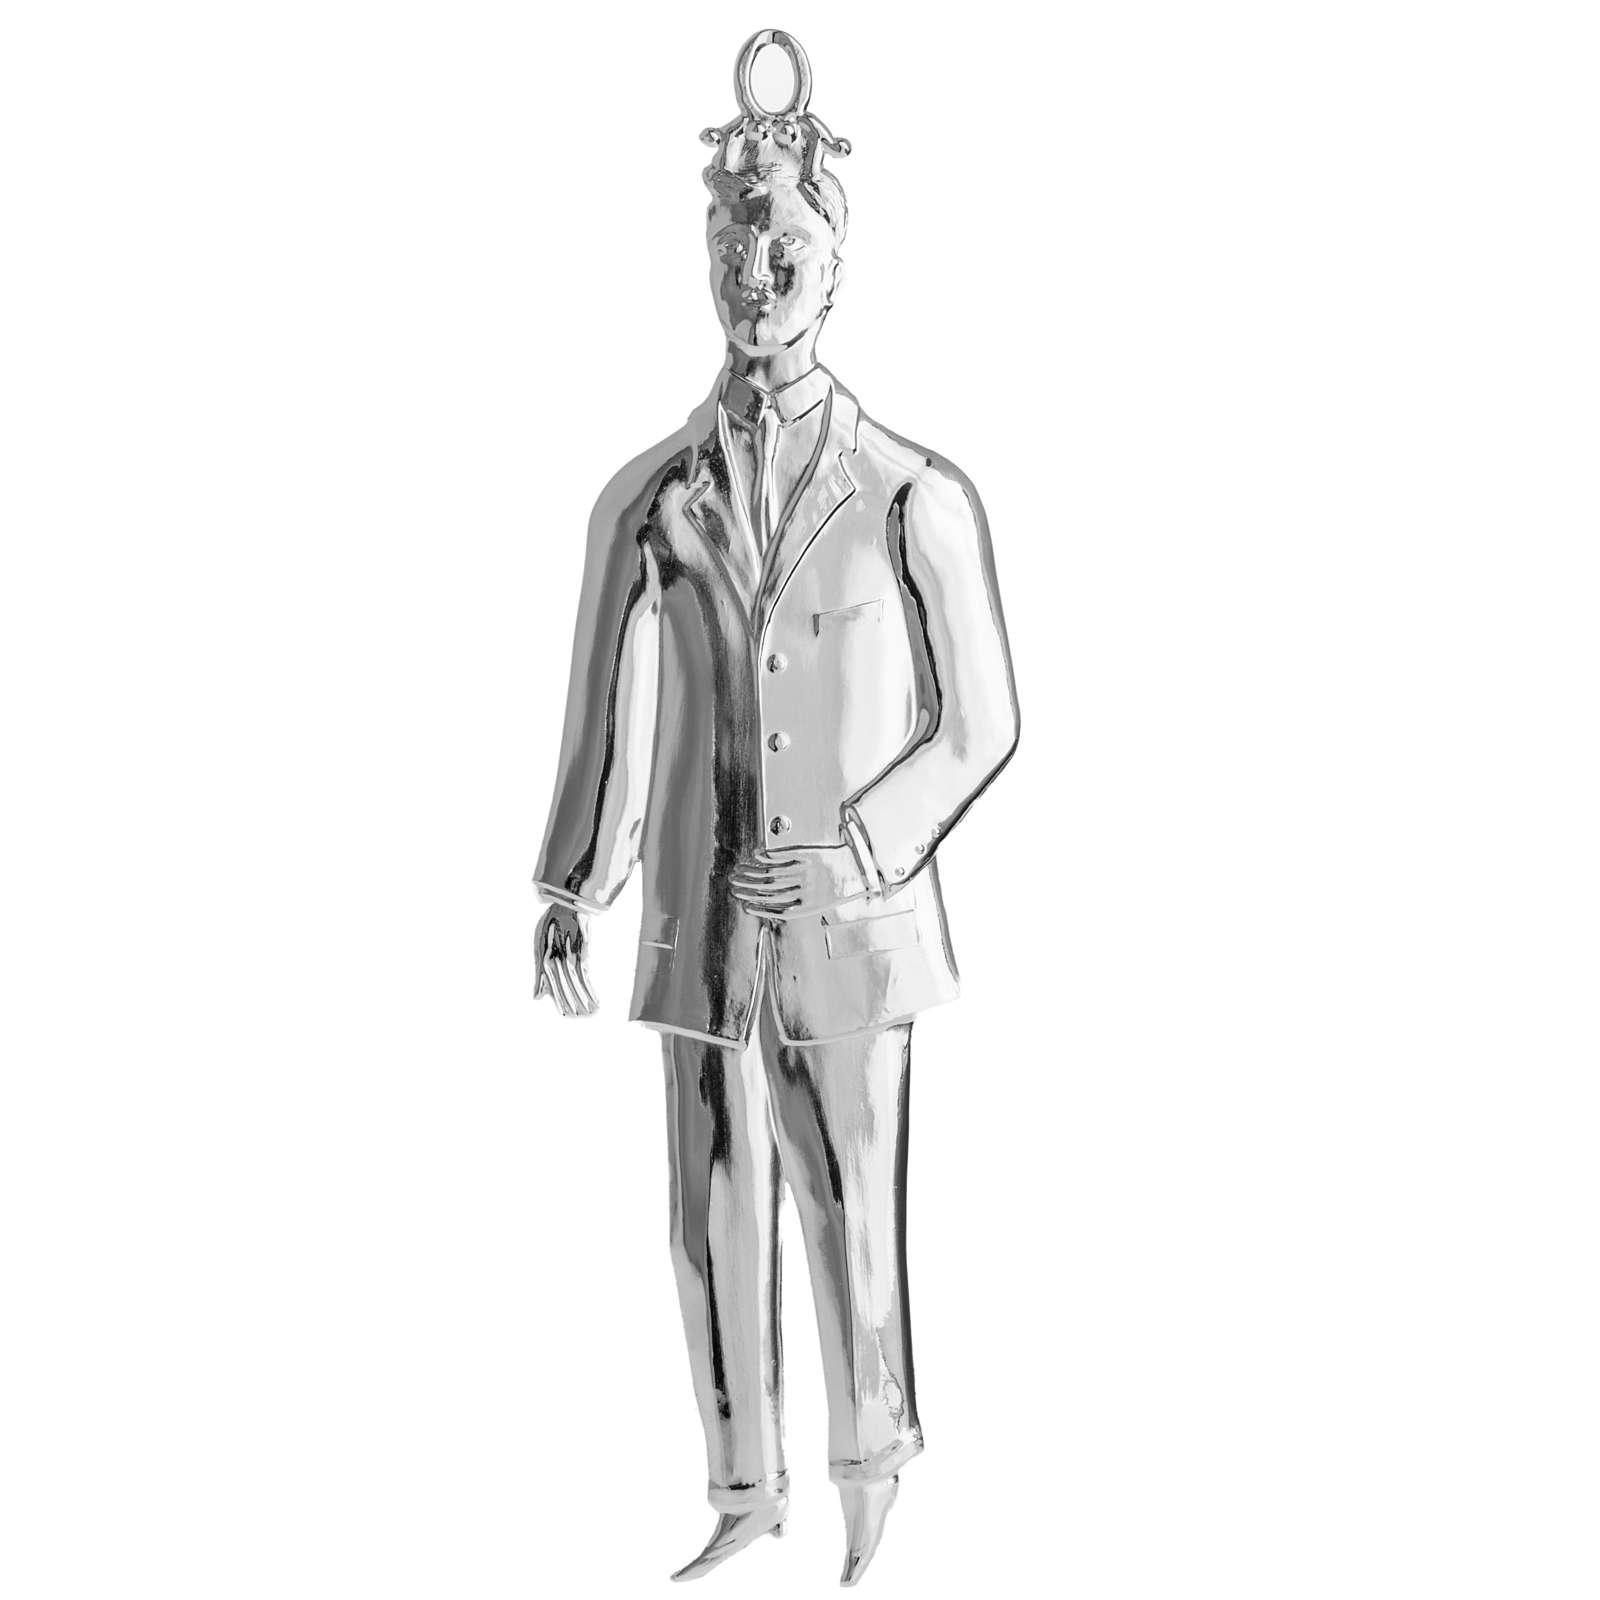 Ex-voto hombre plata 925 o metal 21 cm. 3